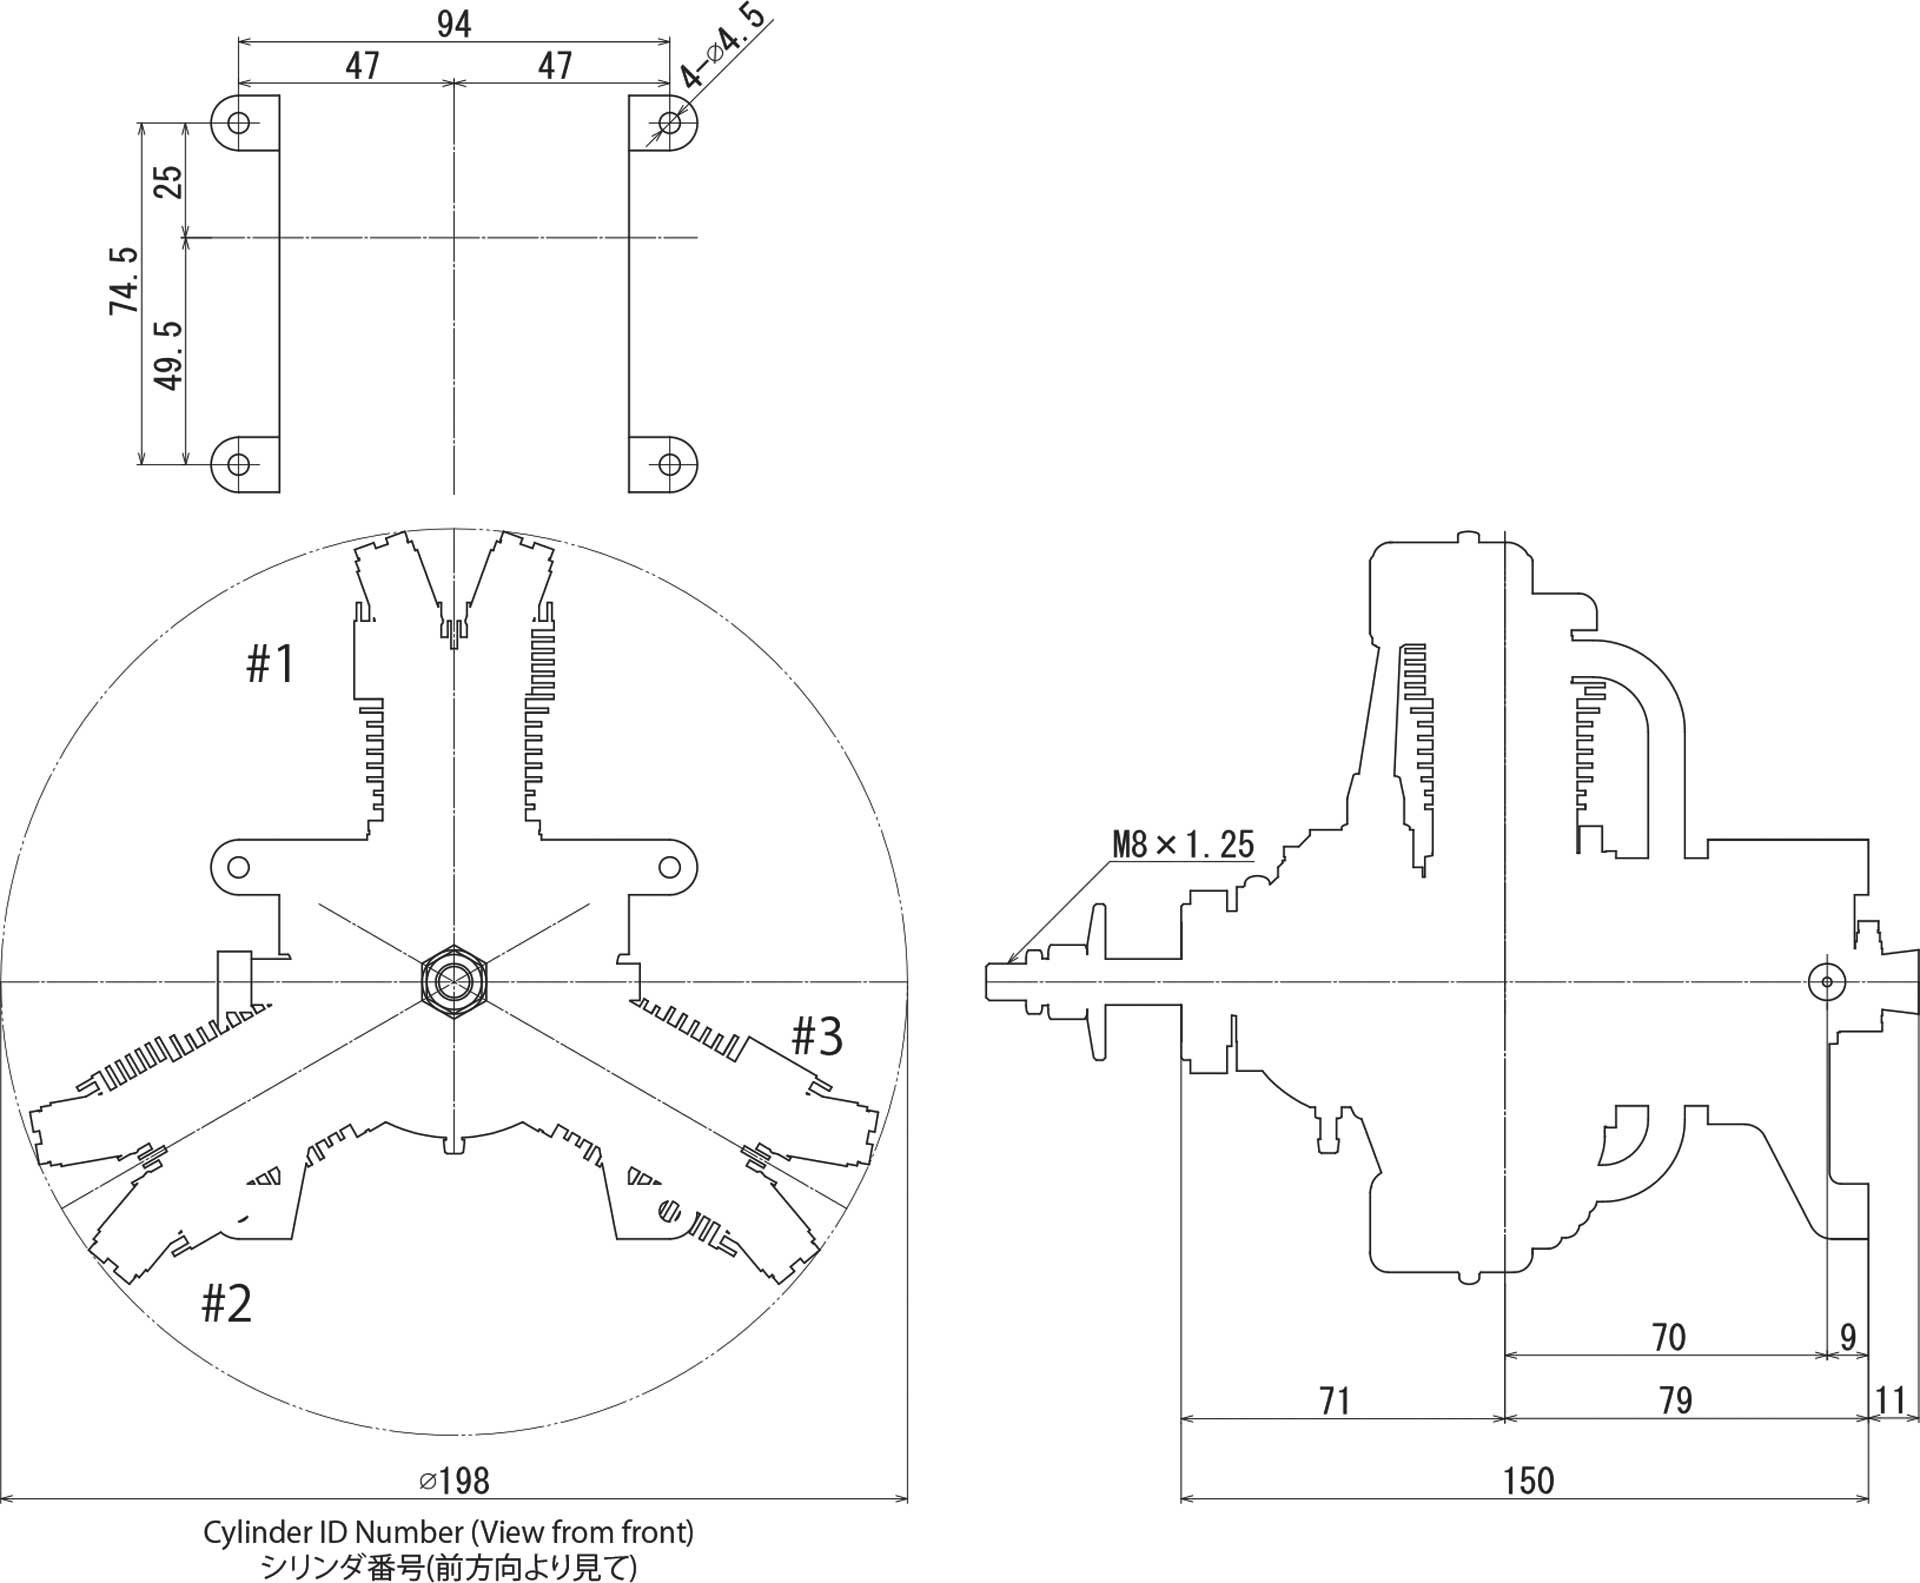 SAITO FG-33R3 BENZIN STERNMOTOR 3-ZYLINDER